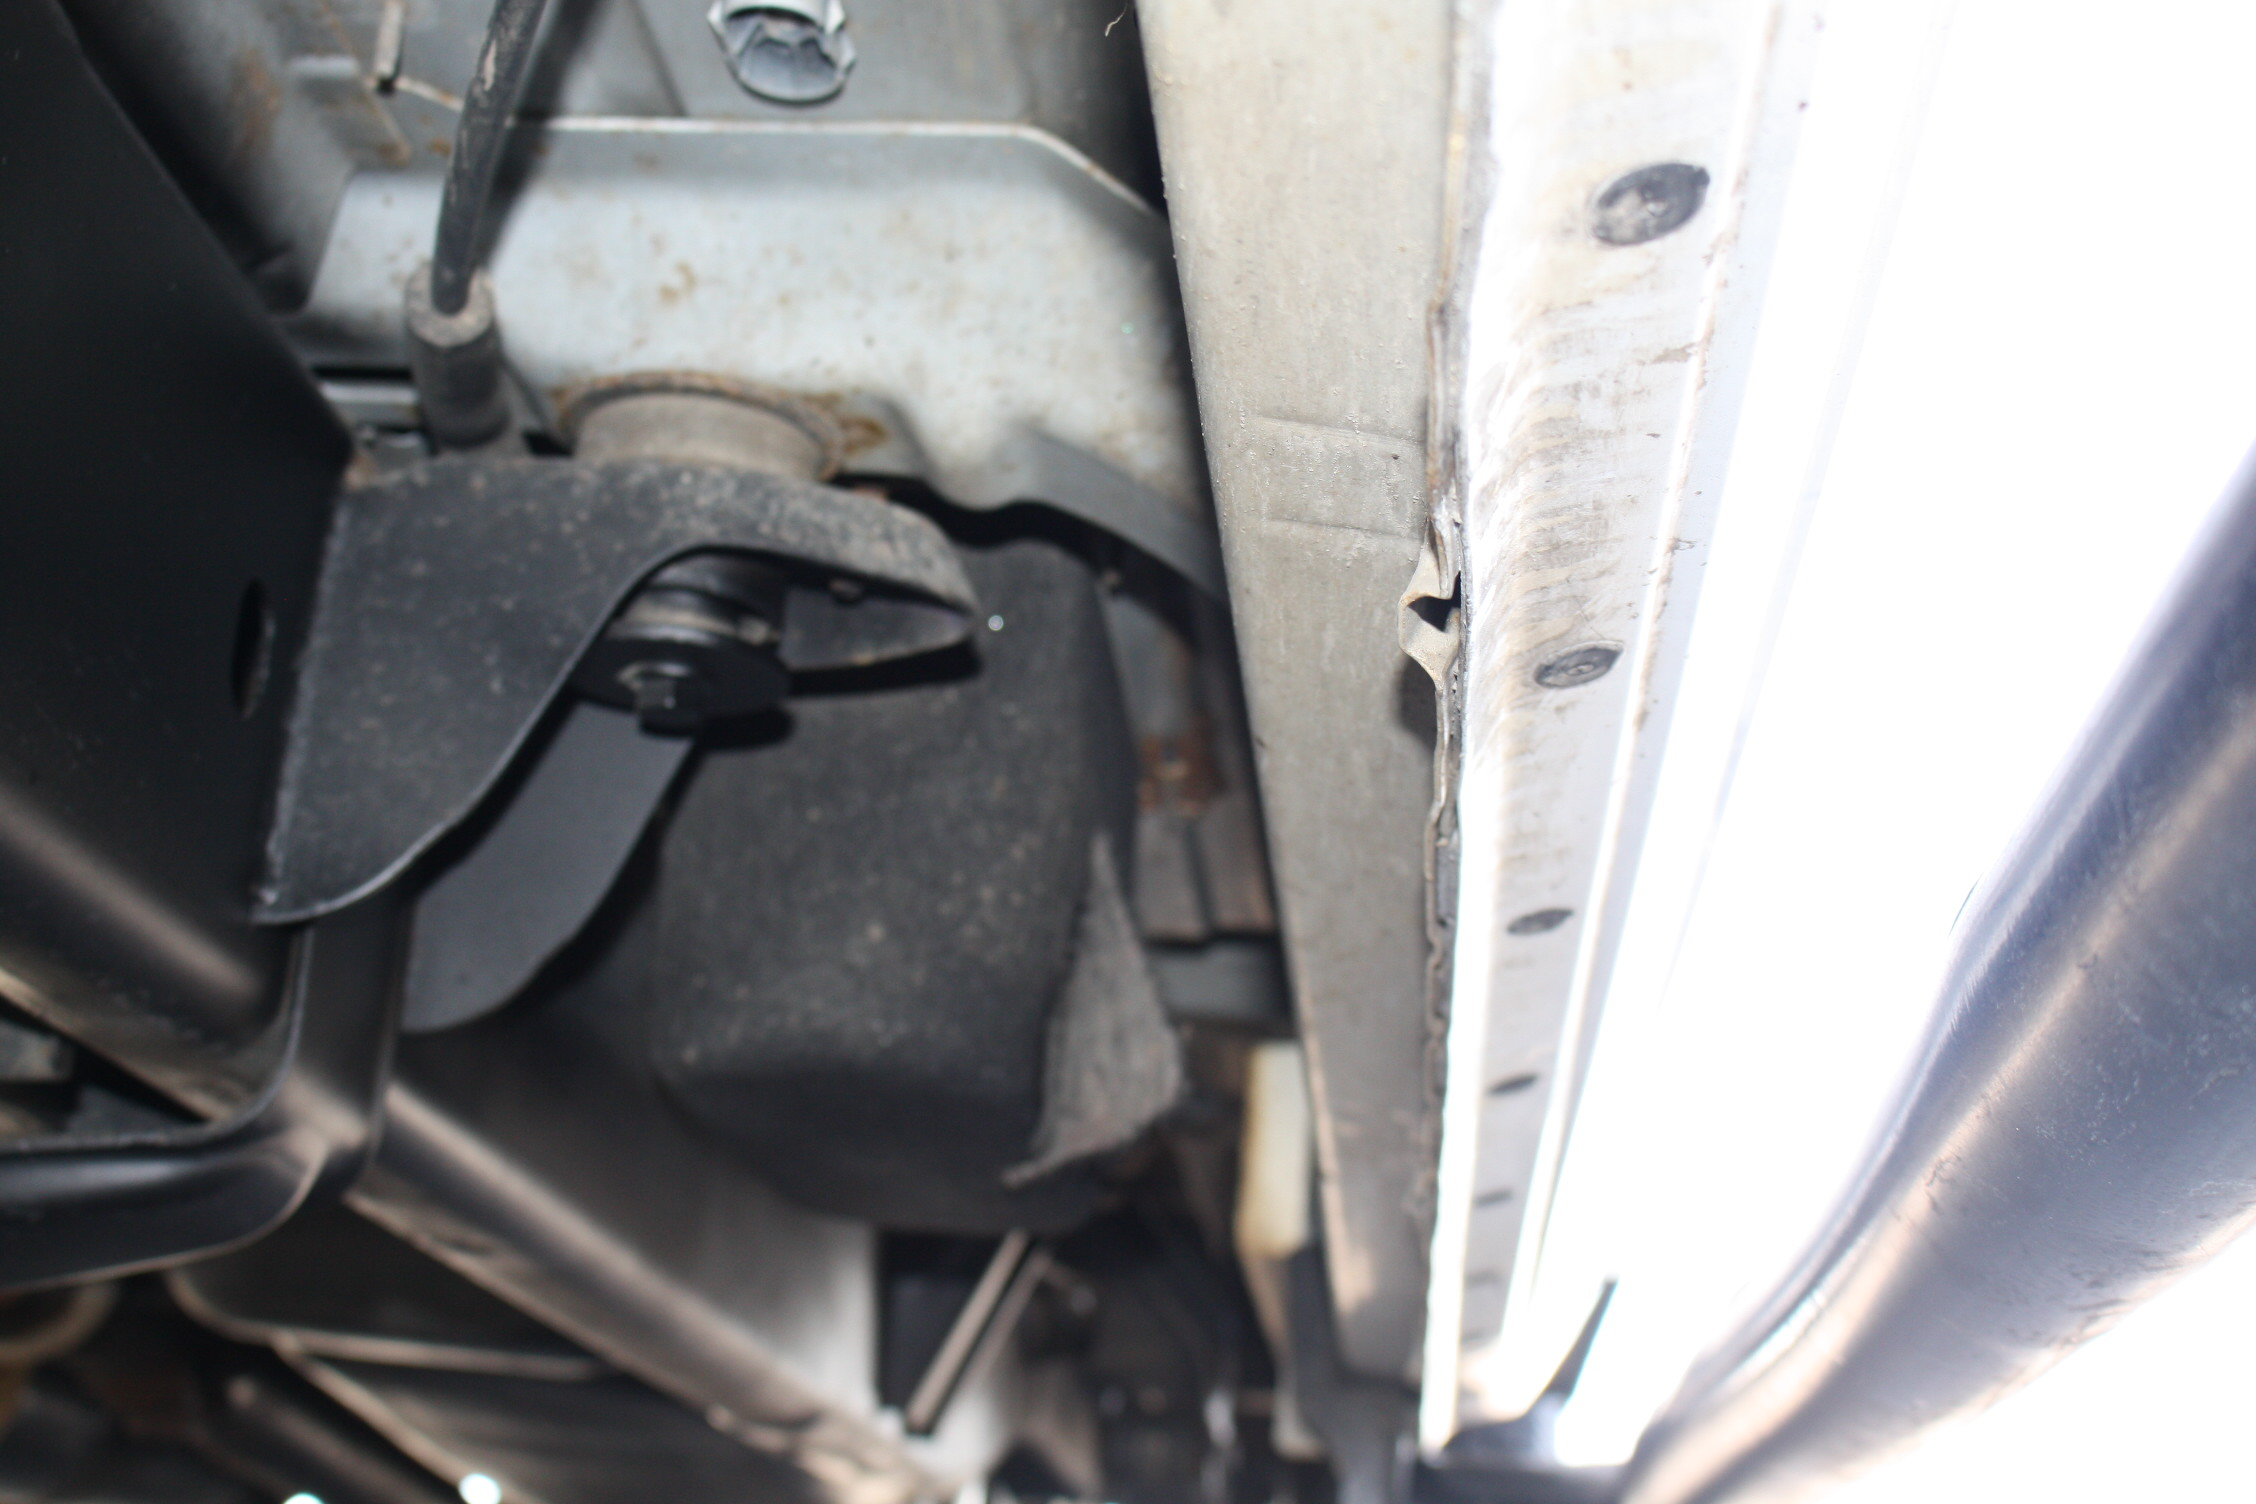 IMG 3022 - 2010 DODGE RAM 2500HD KNAPHEIDE UTILITY TRUCK